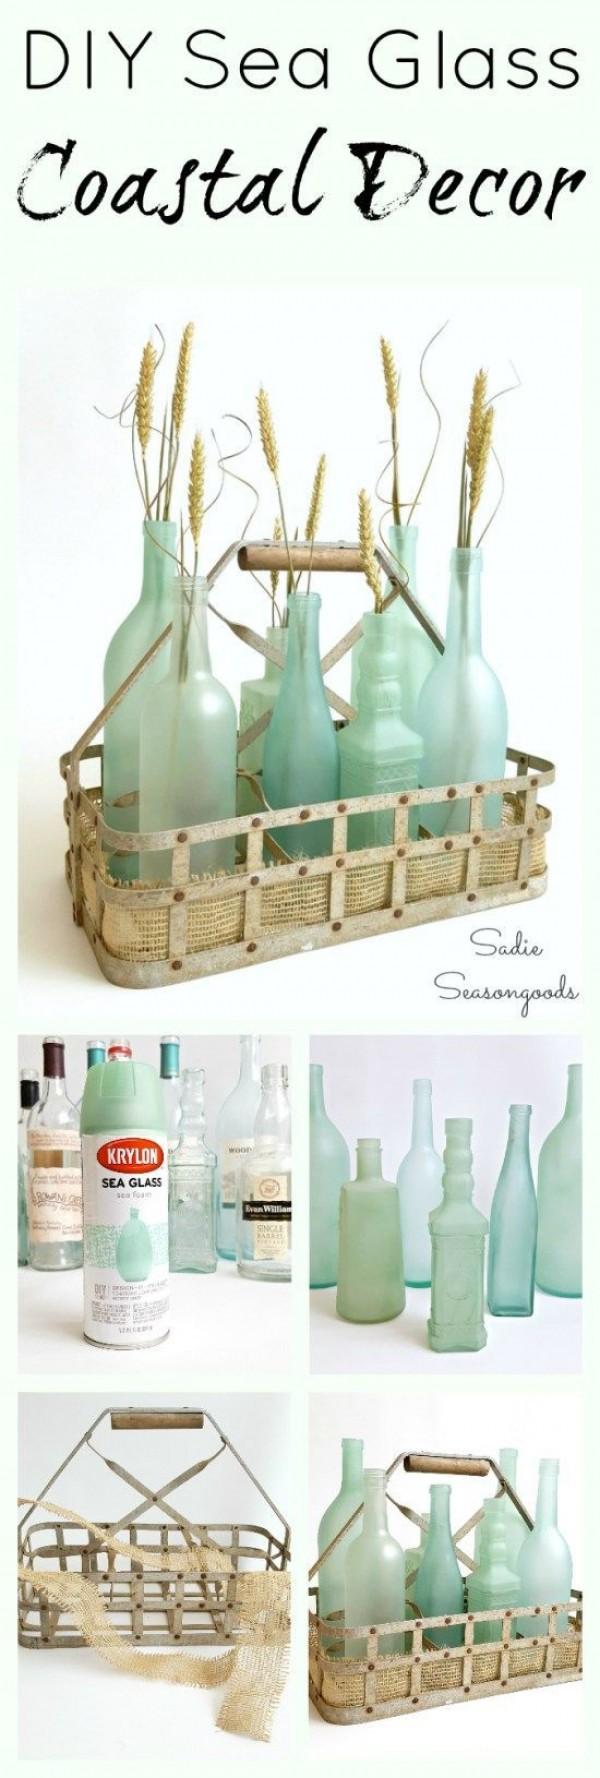 Sea Glass Bottles.